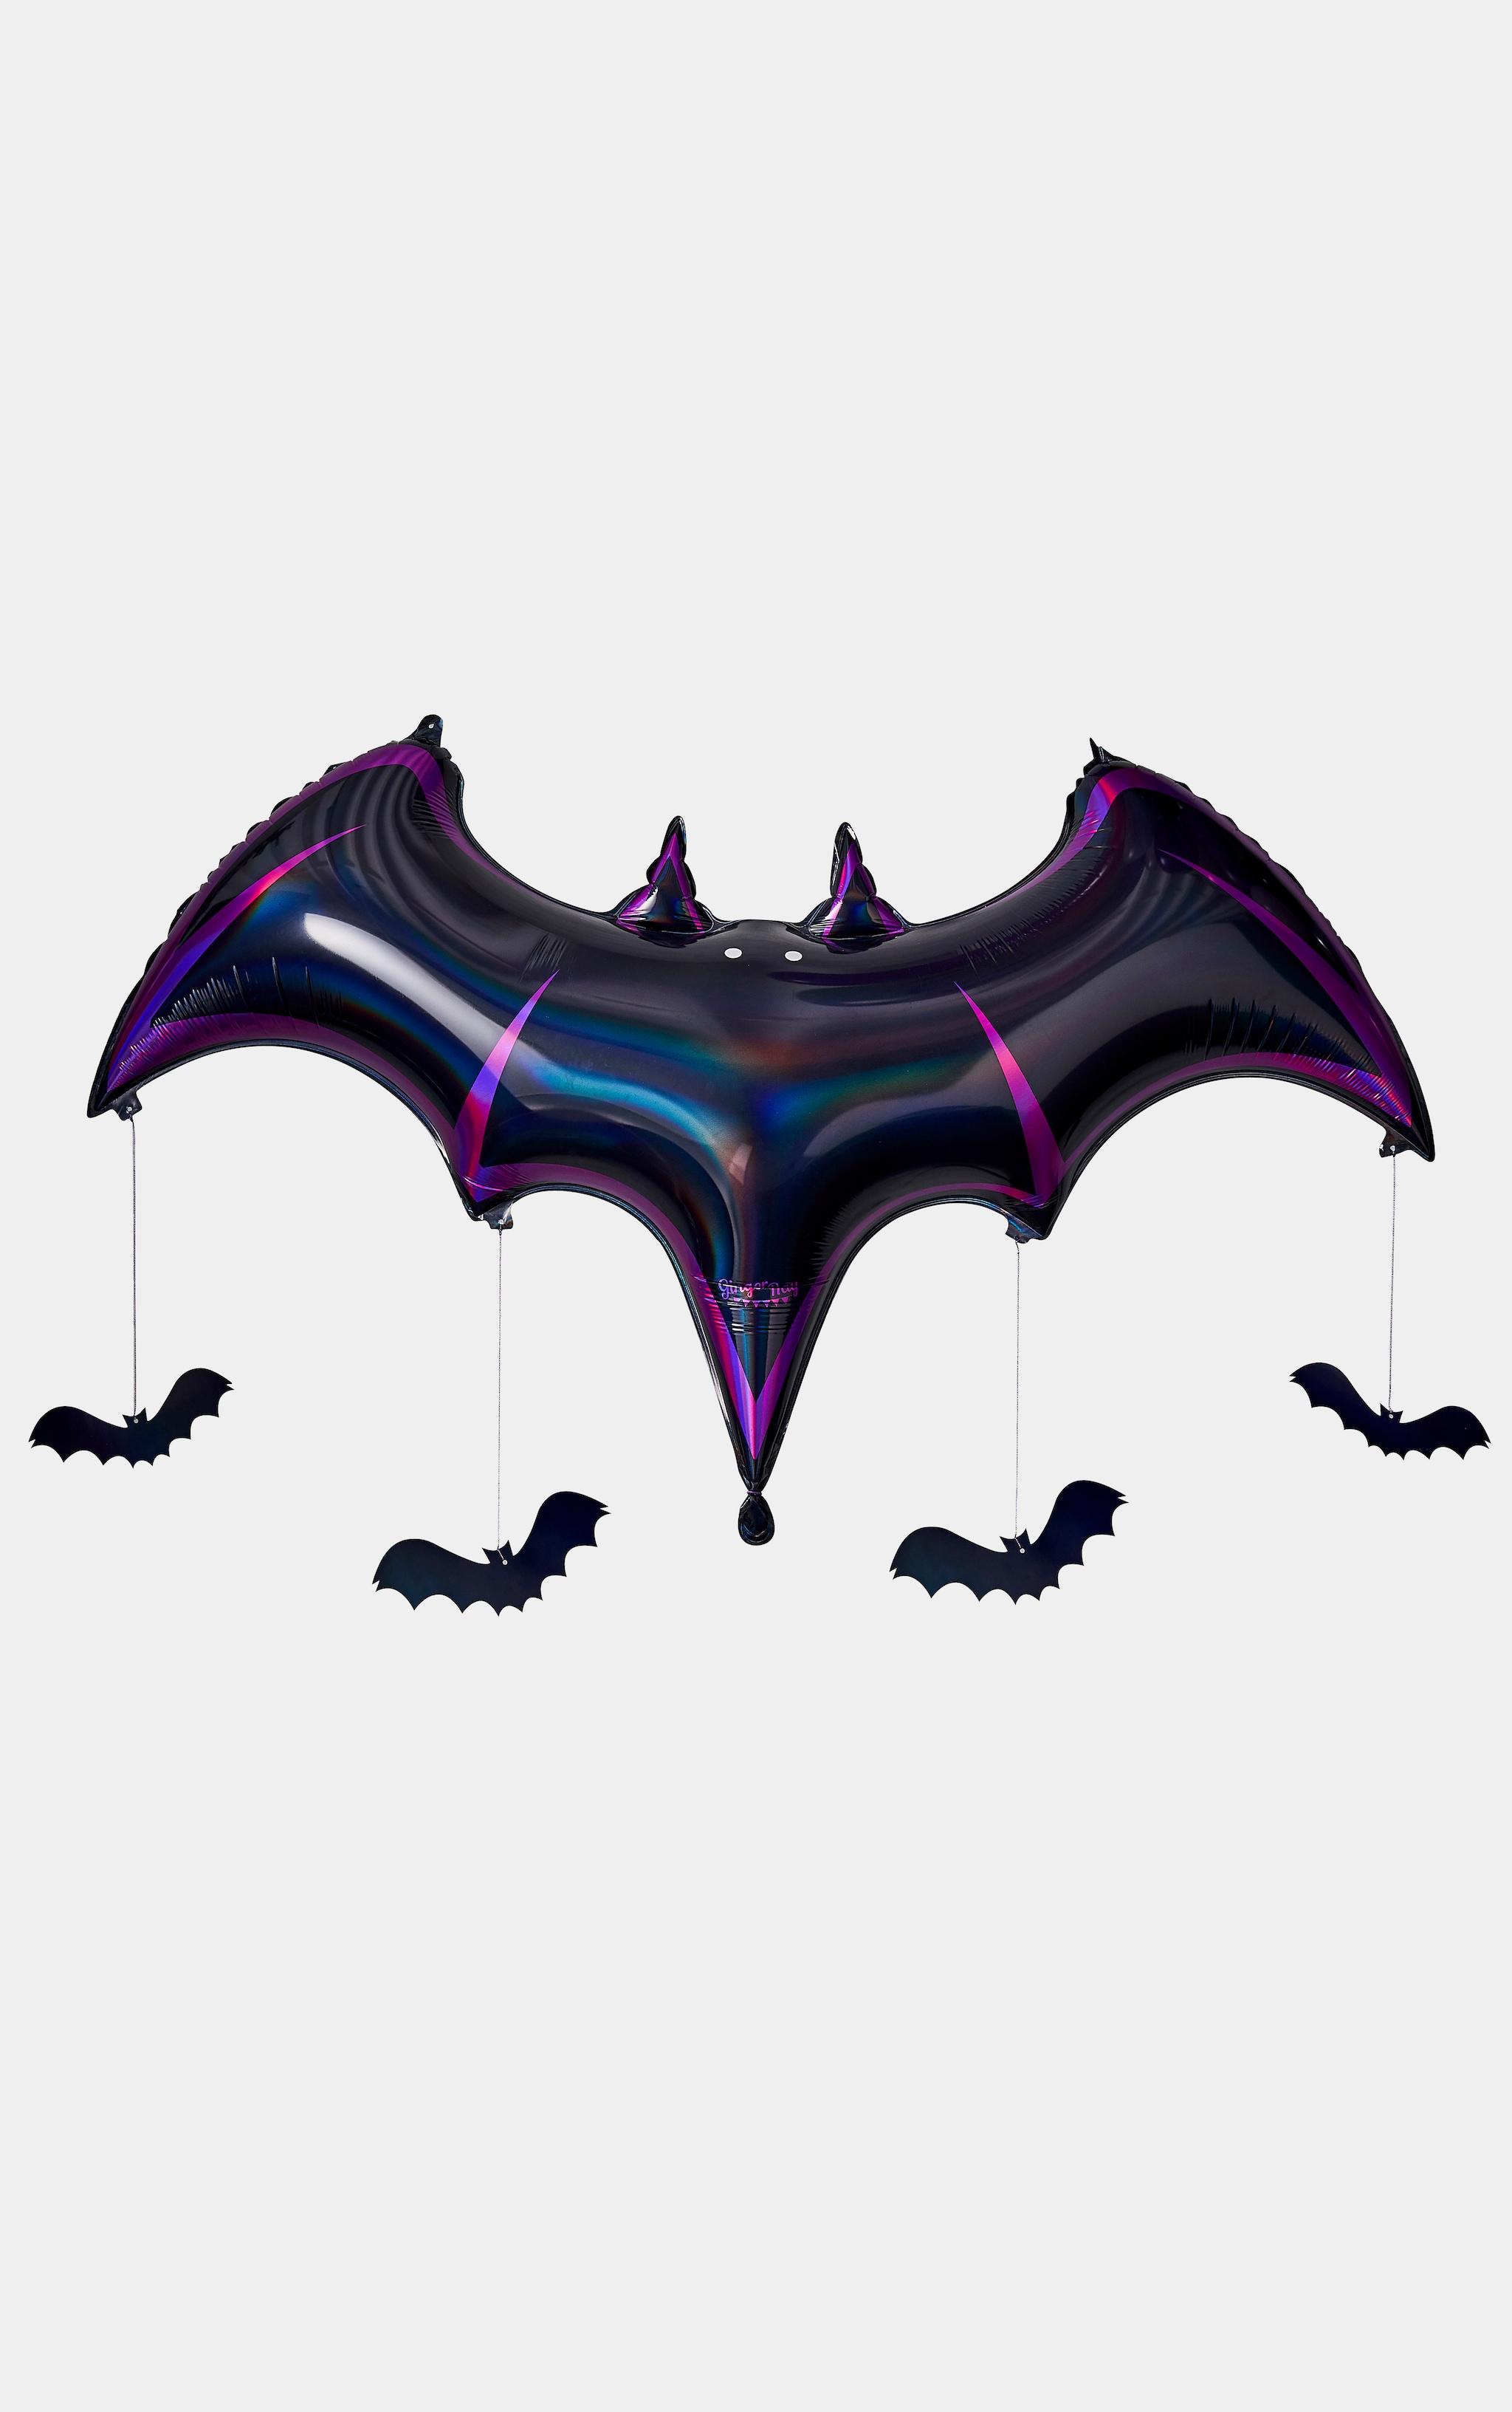 Ginger Ray Foil Balloon Bat Shaped Balloons 2